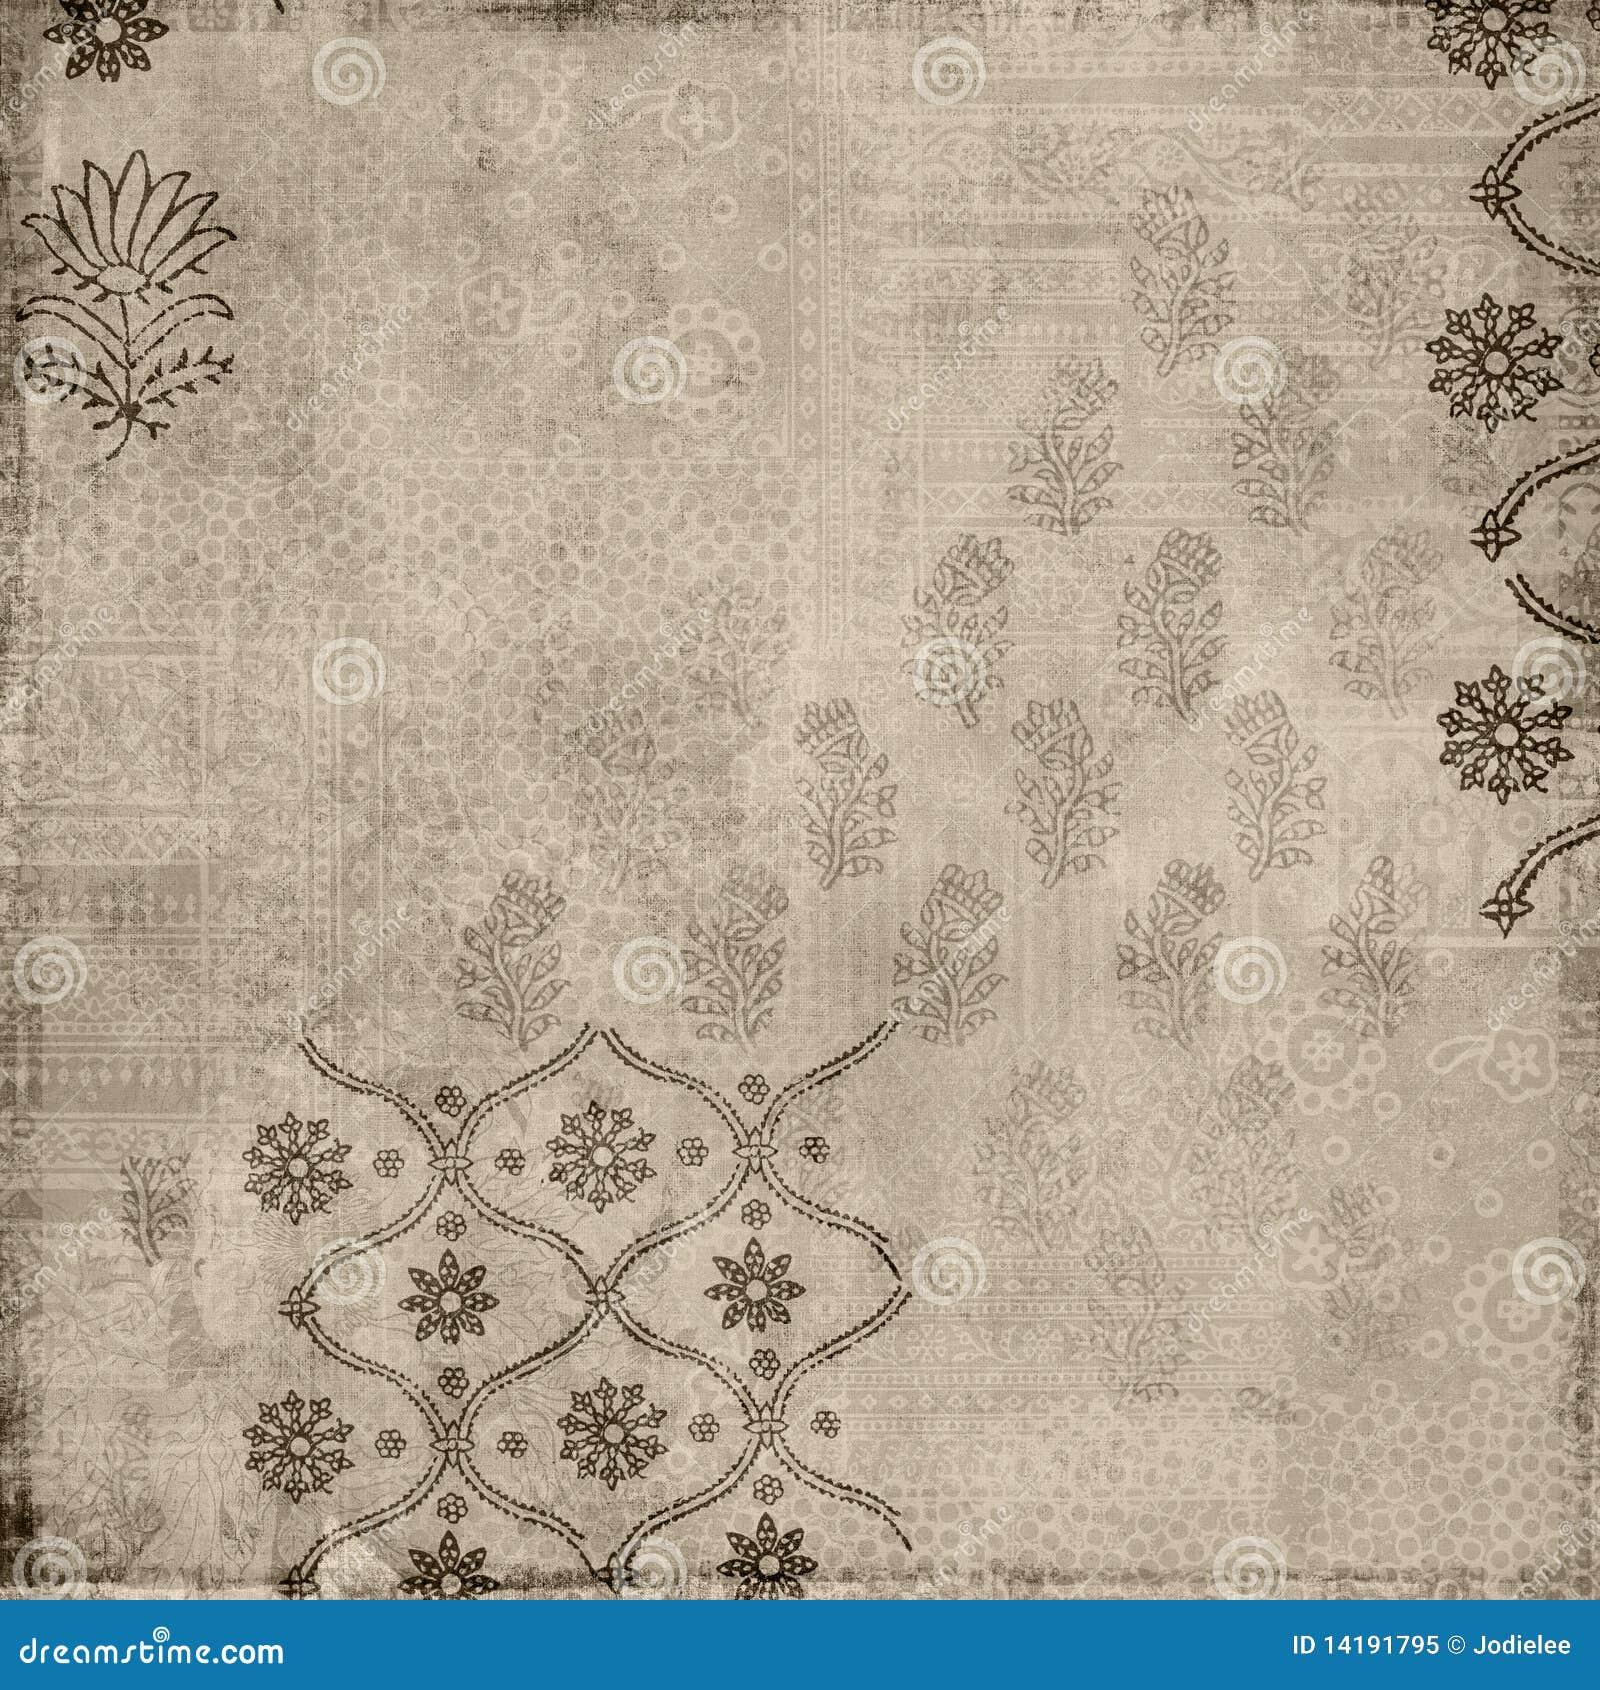 vintage floral brown css html brown floral vintage style batik st background royalty